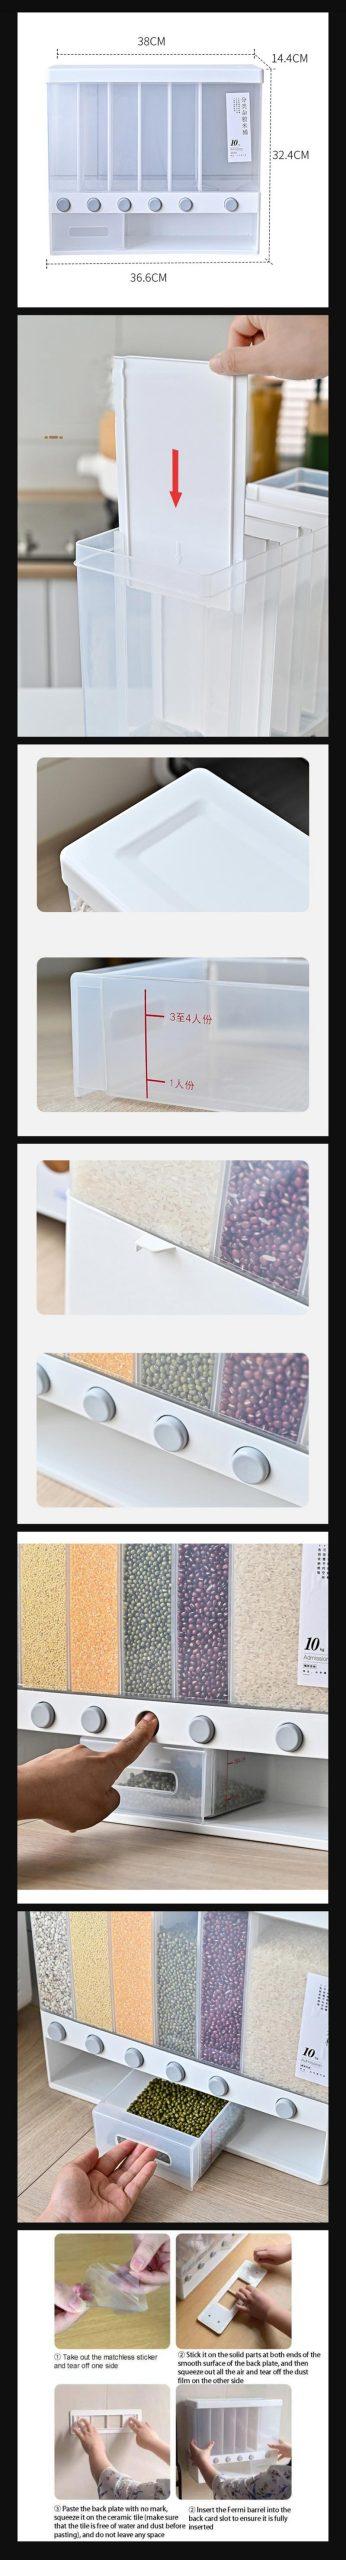 Food Dispenser For Kitchen